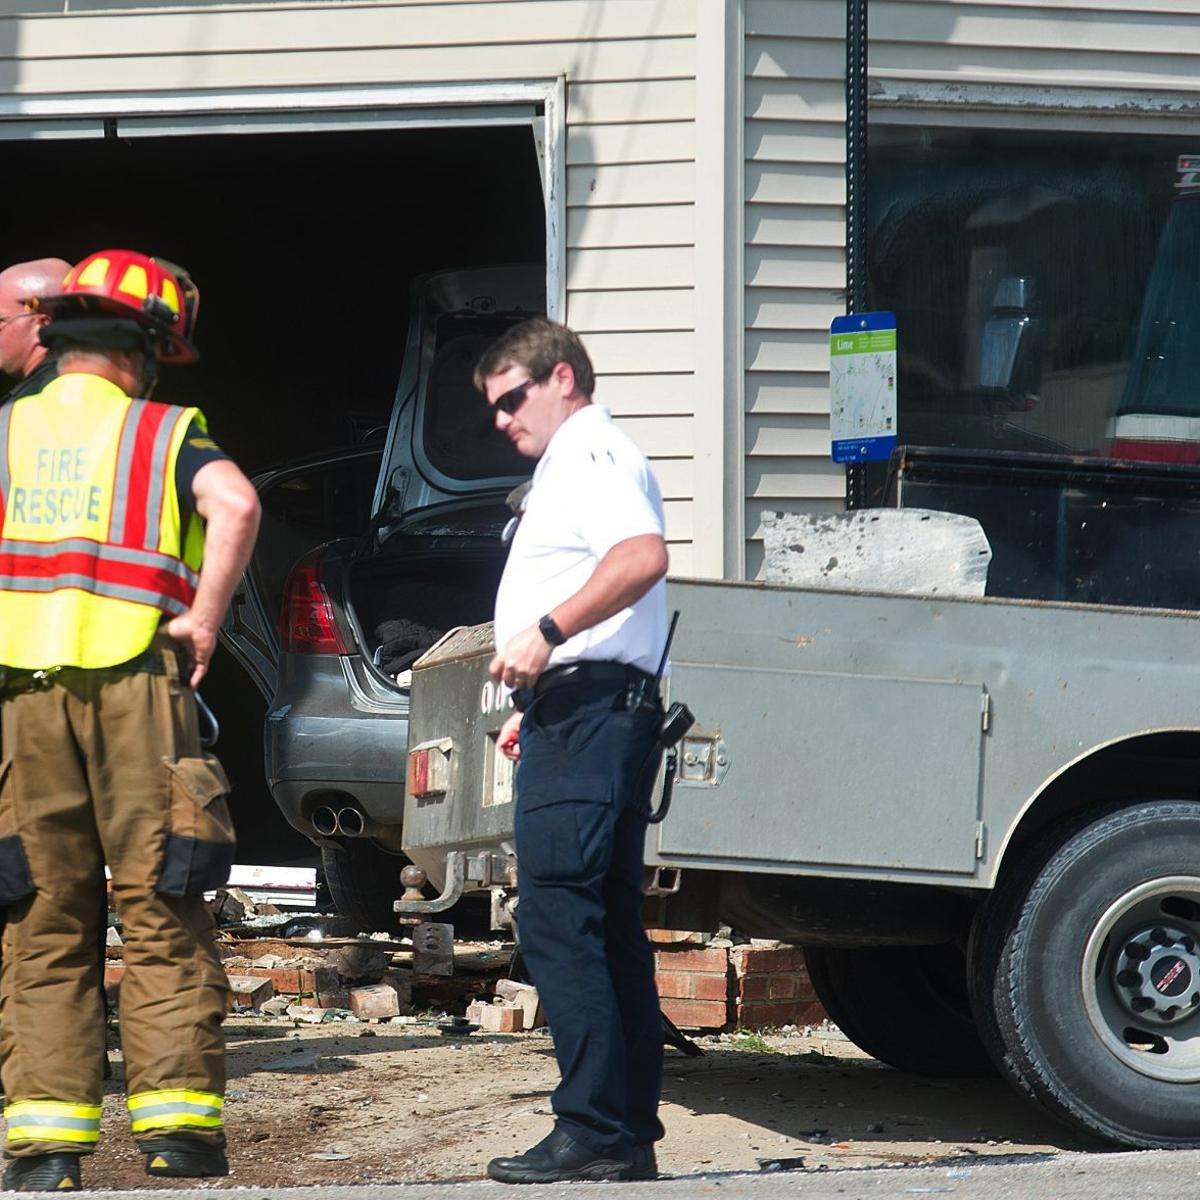 Bloomington police handle rollover crash on Morrissey, car in